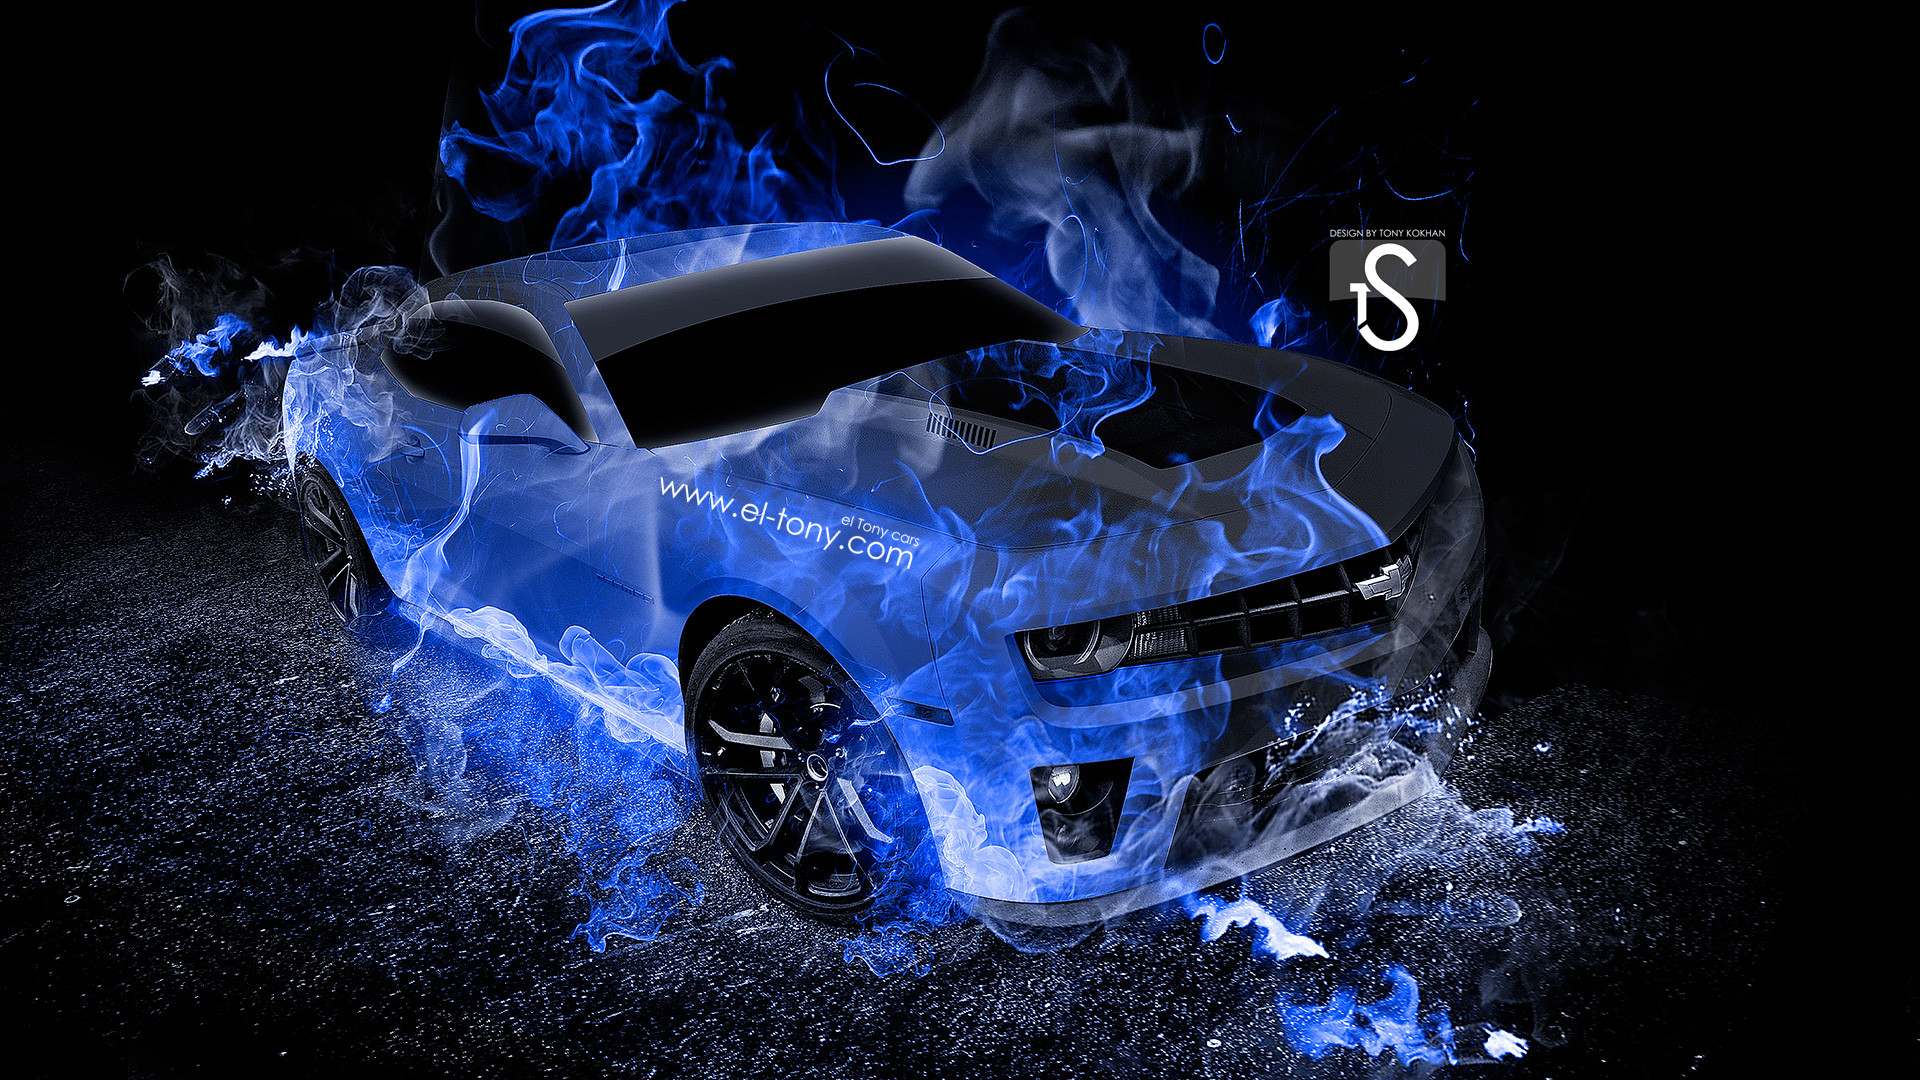 Chevrolet-Camaro-Blue-Fire-Abstract-Car-2013-HD- …